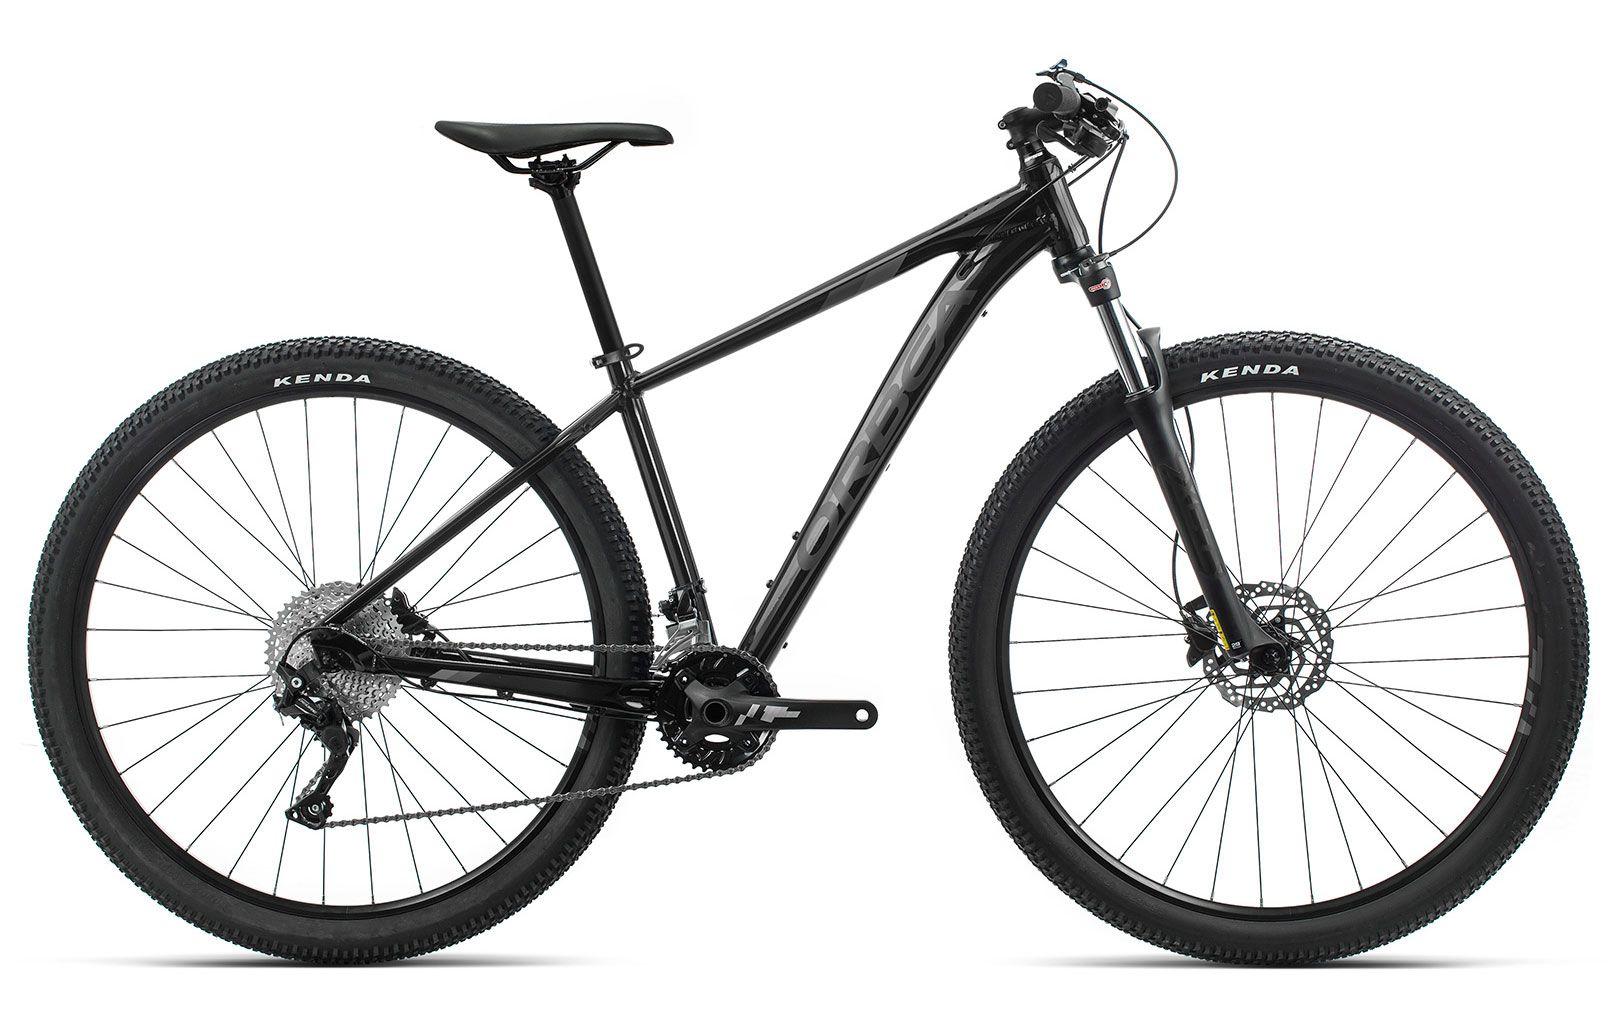 Bicicleta MTB Orbea MX 29 30 - Tam M - Preto/Cinza(mate) 2020